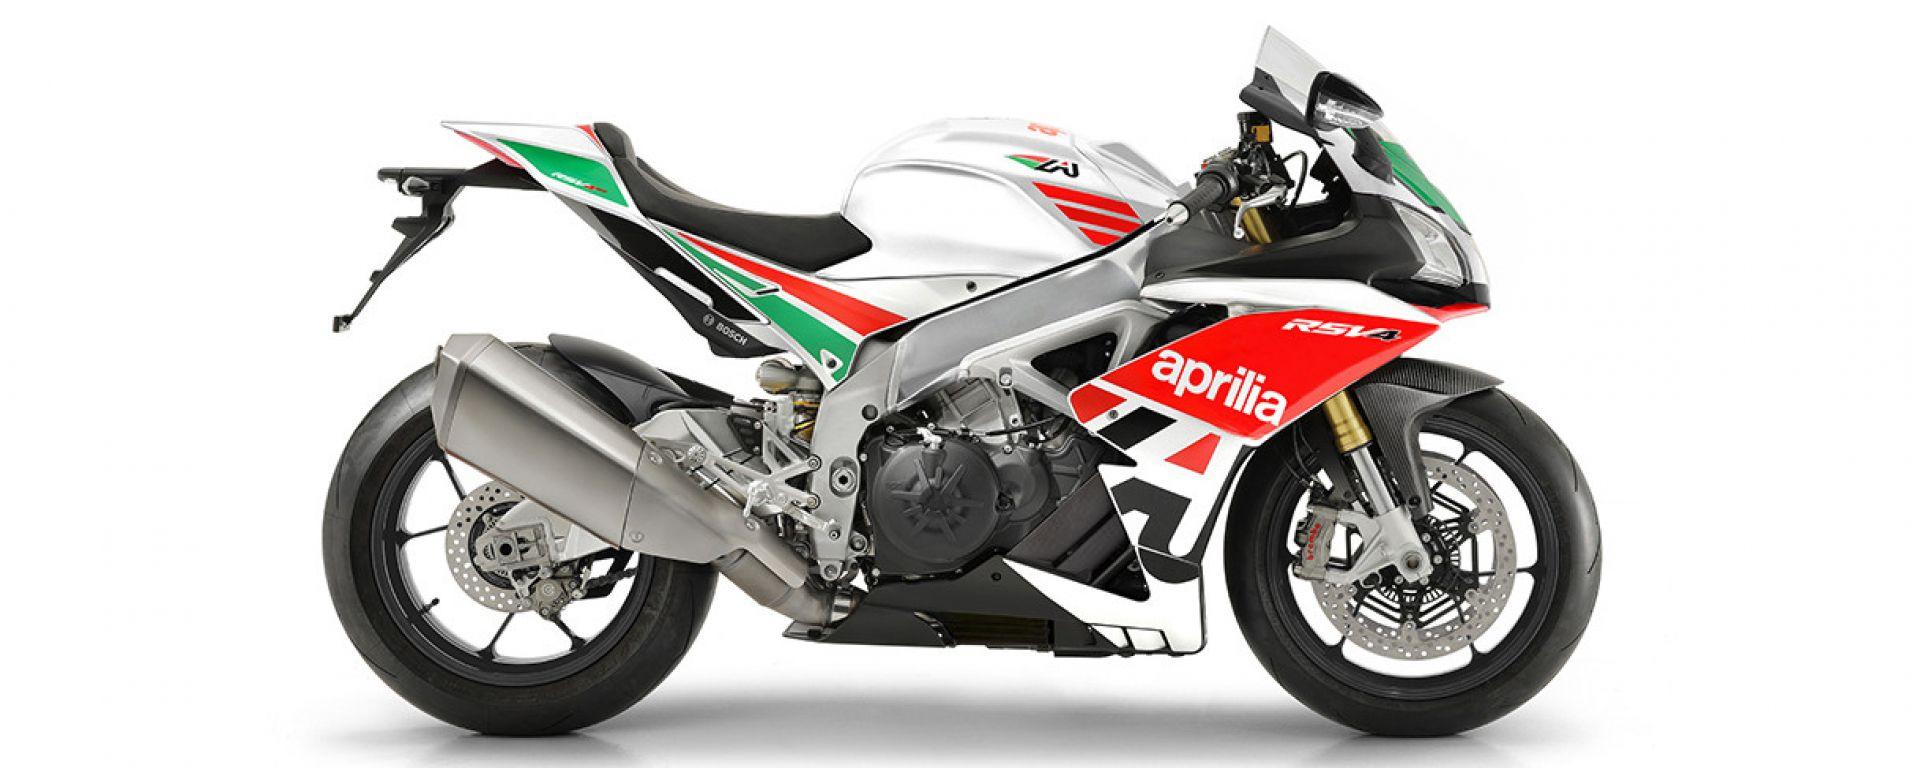 Aprilia RSV4 RR Misano Edition